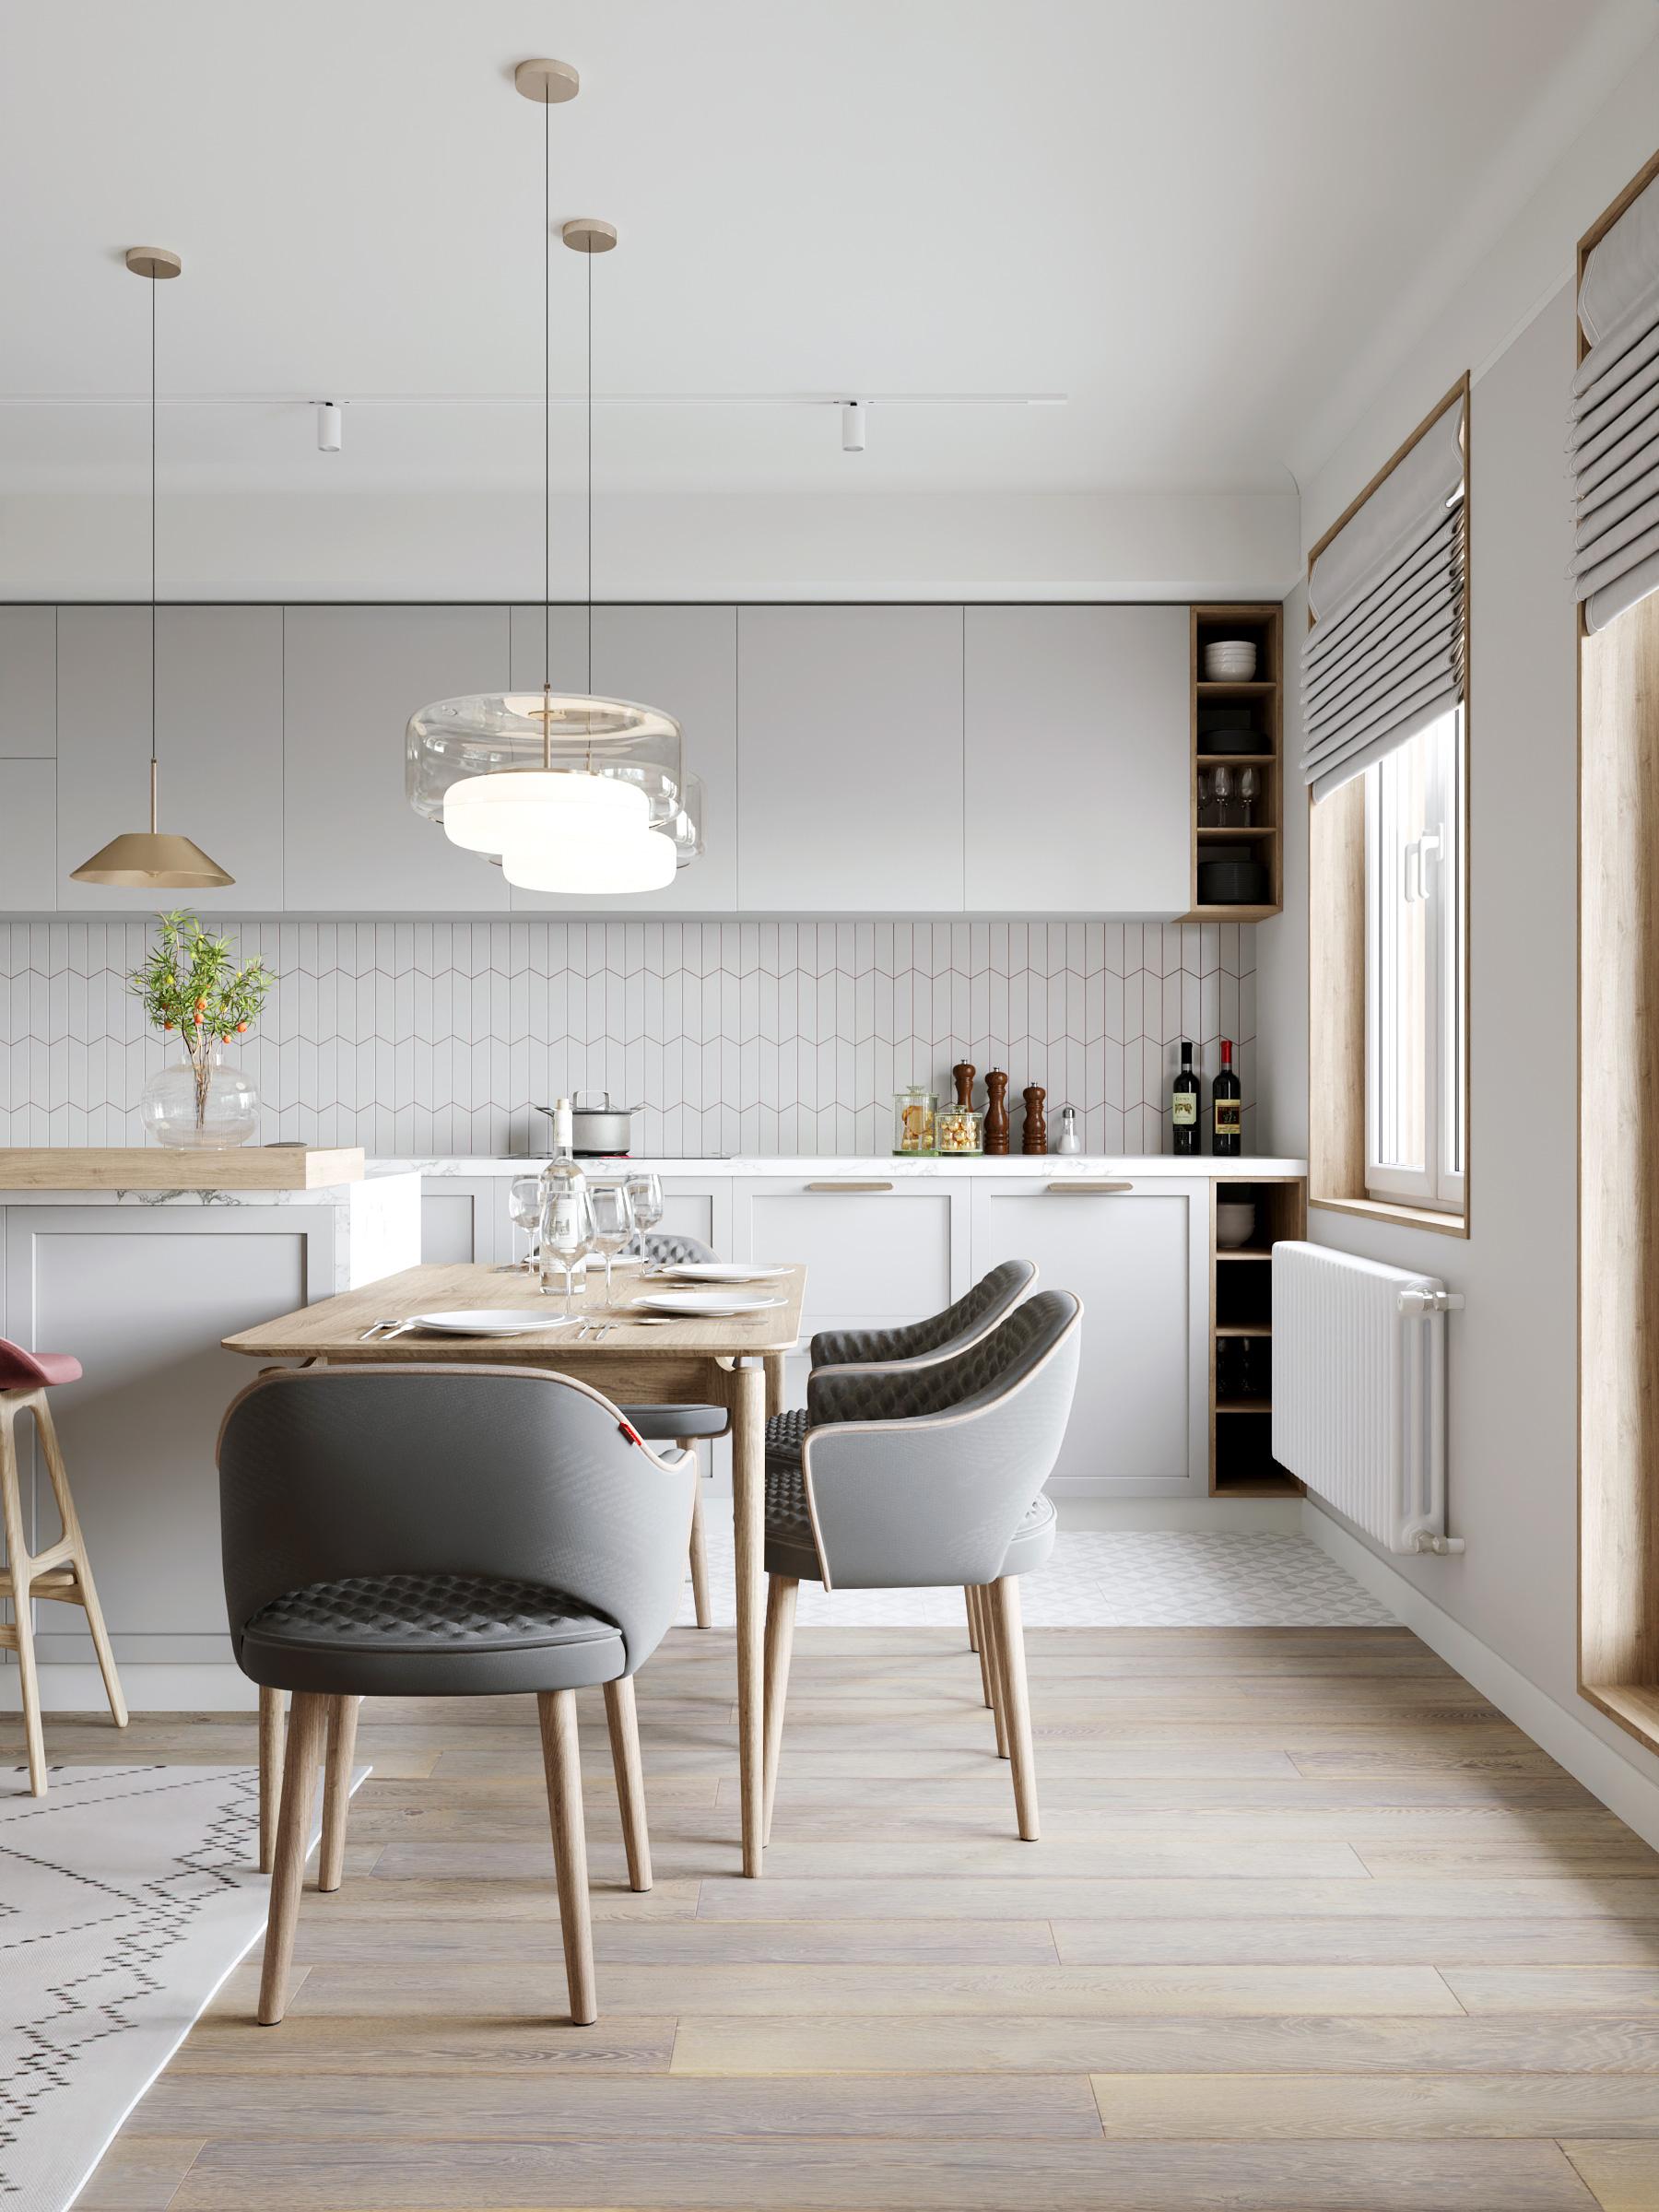 дизайн-проект квартиры в ЖК Skandi Klubb